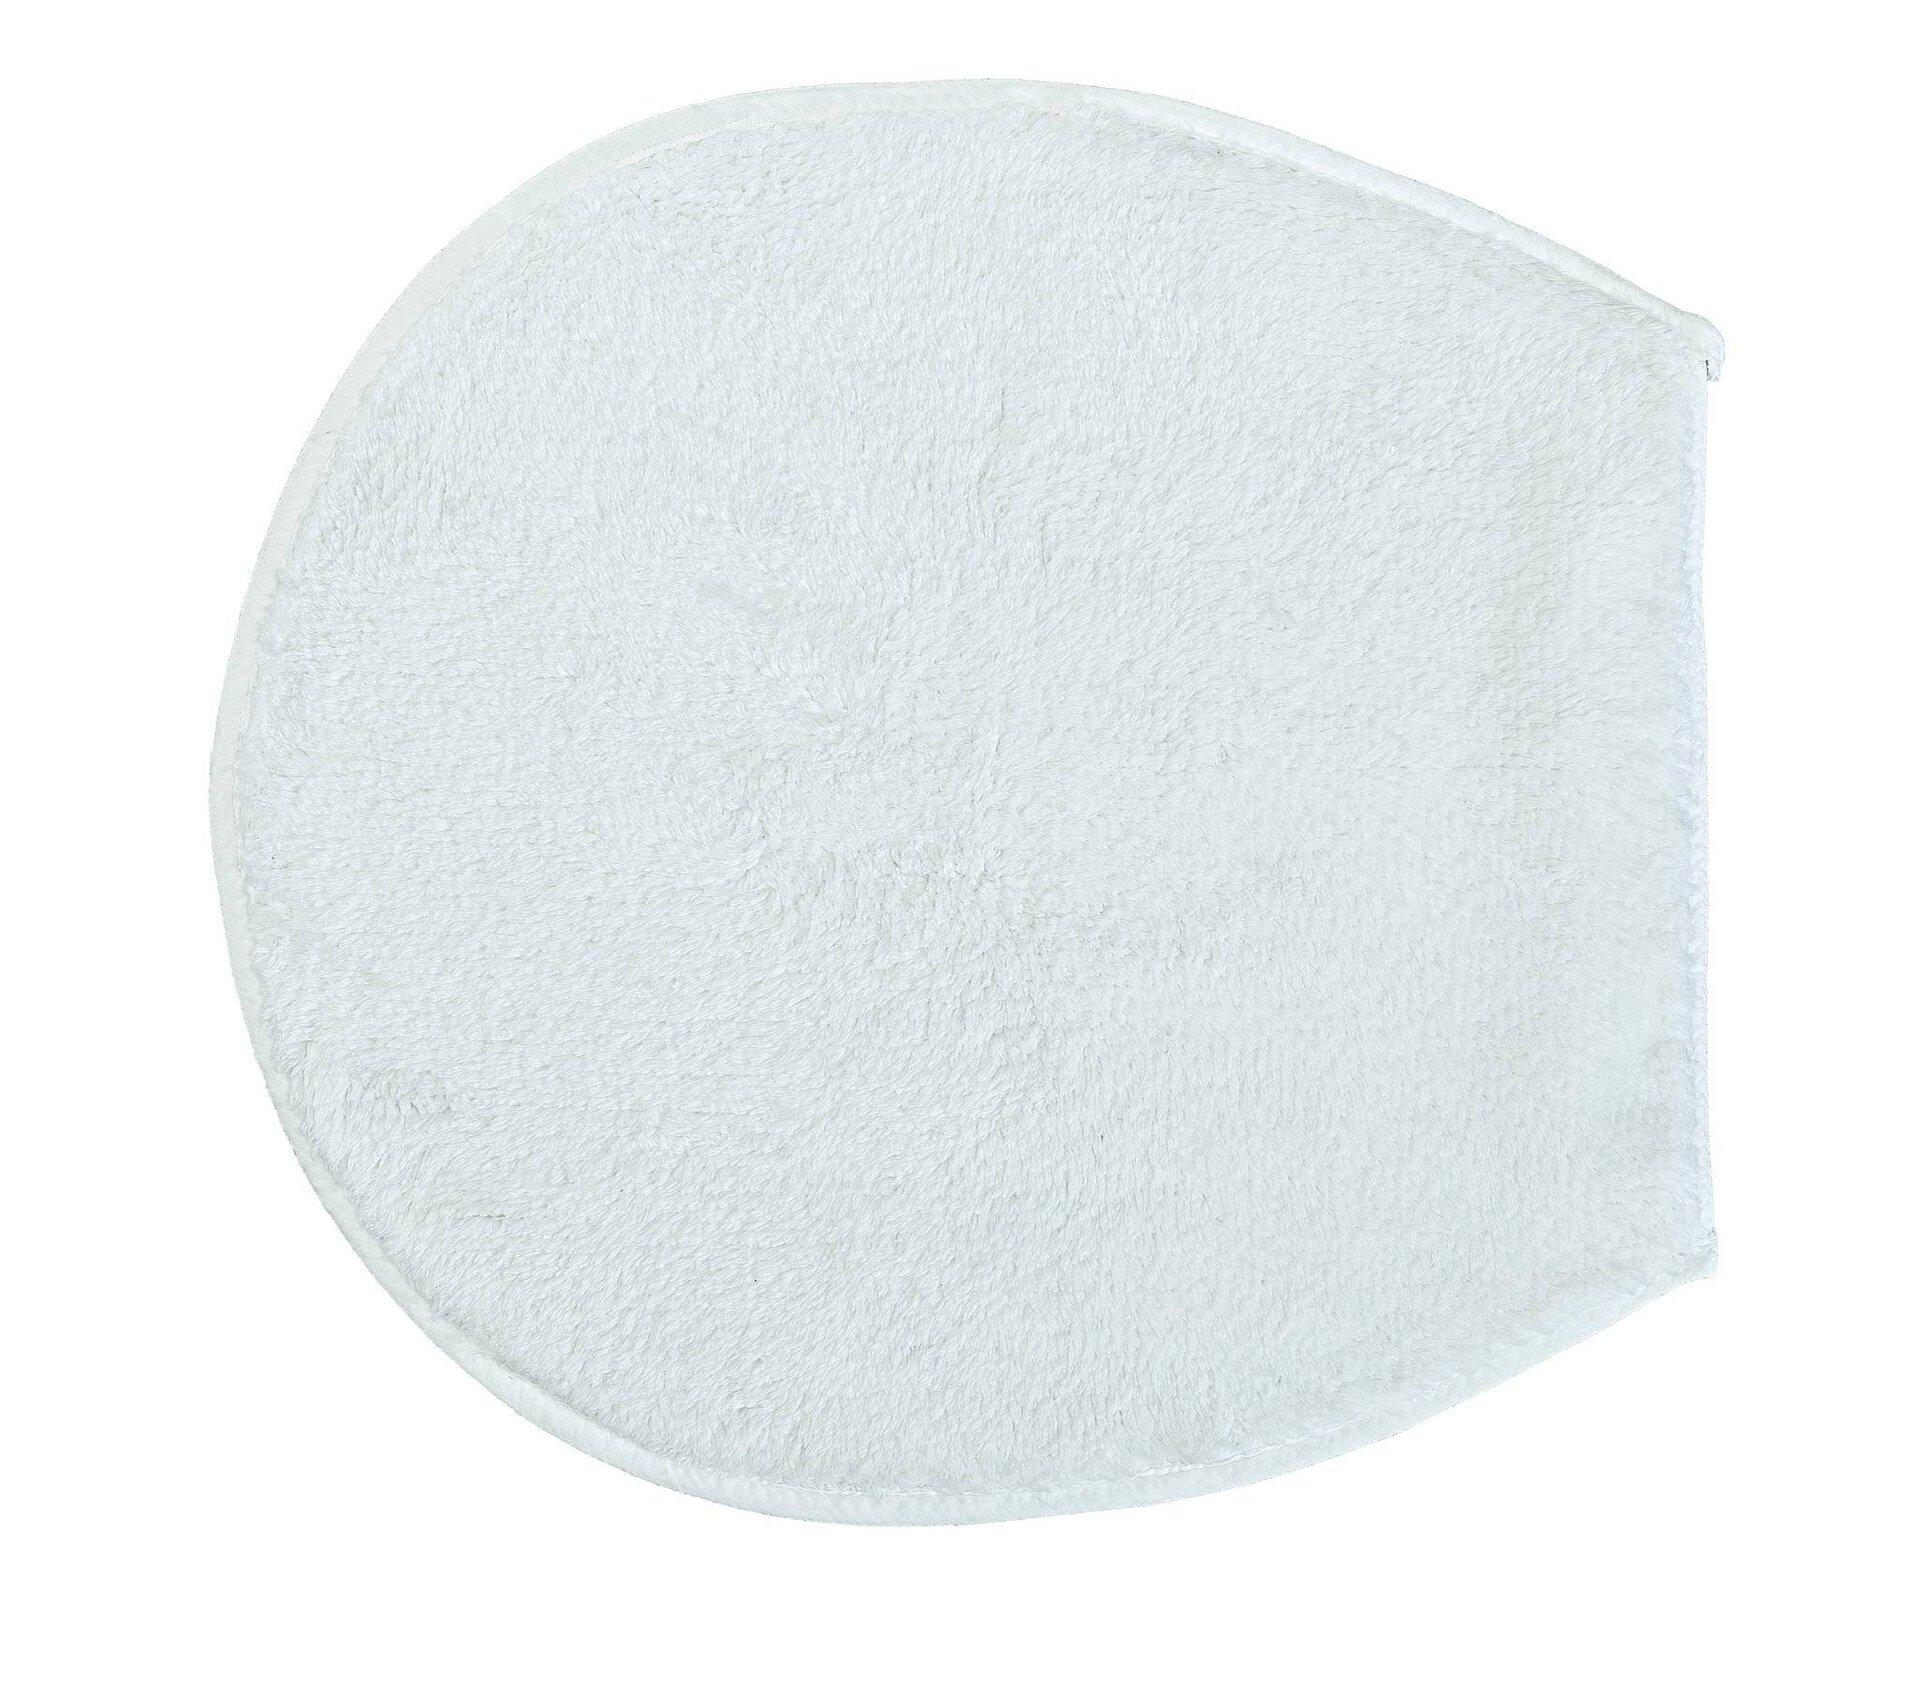 Deckelbezug Cotone Meusch Textil 50 x 1 x 47 cm